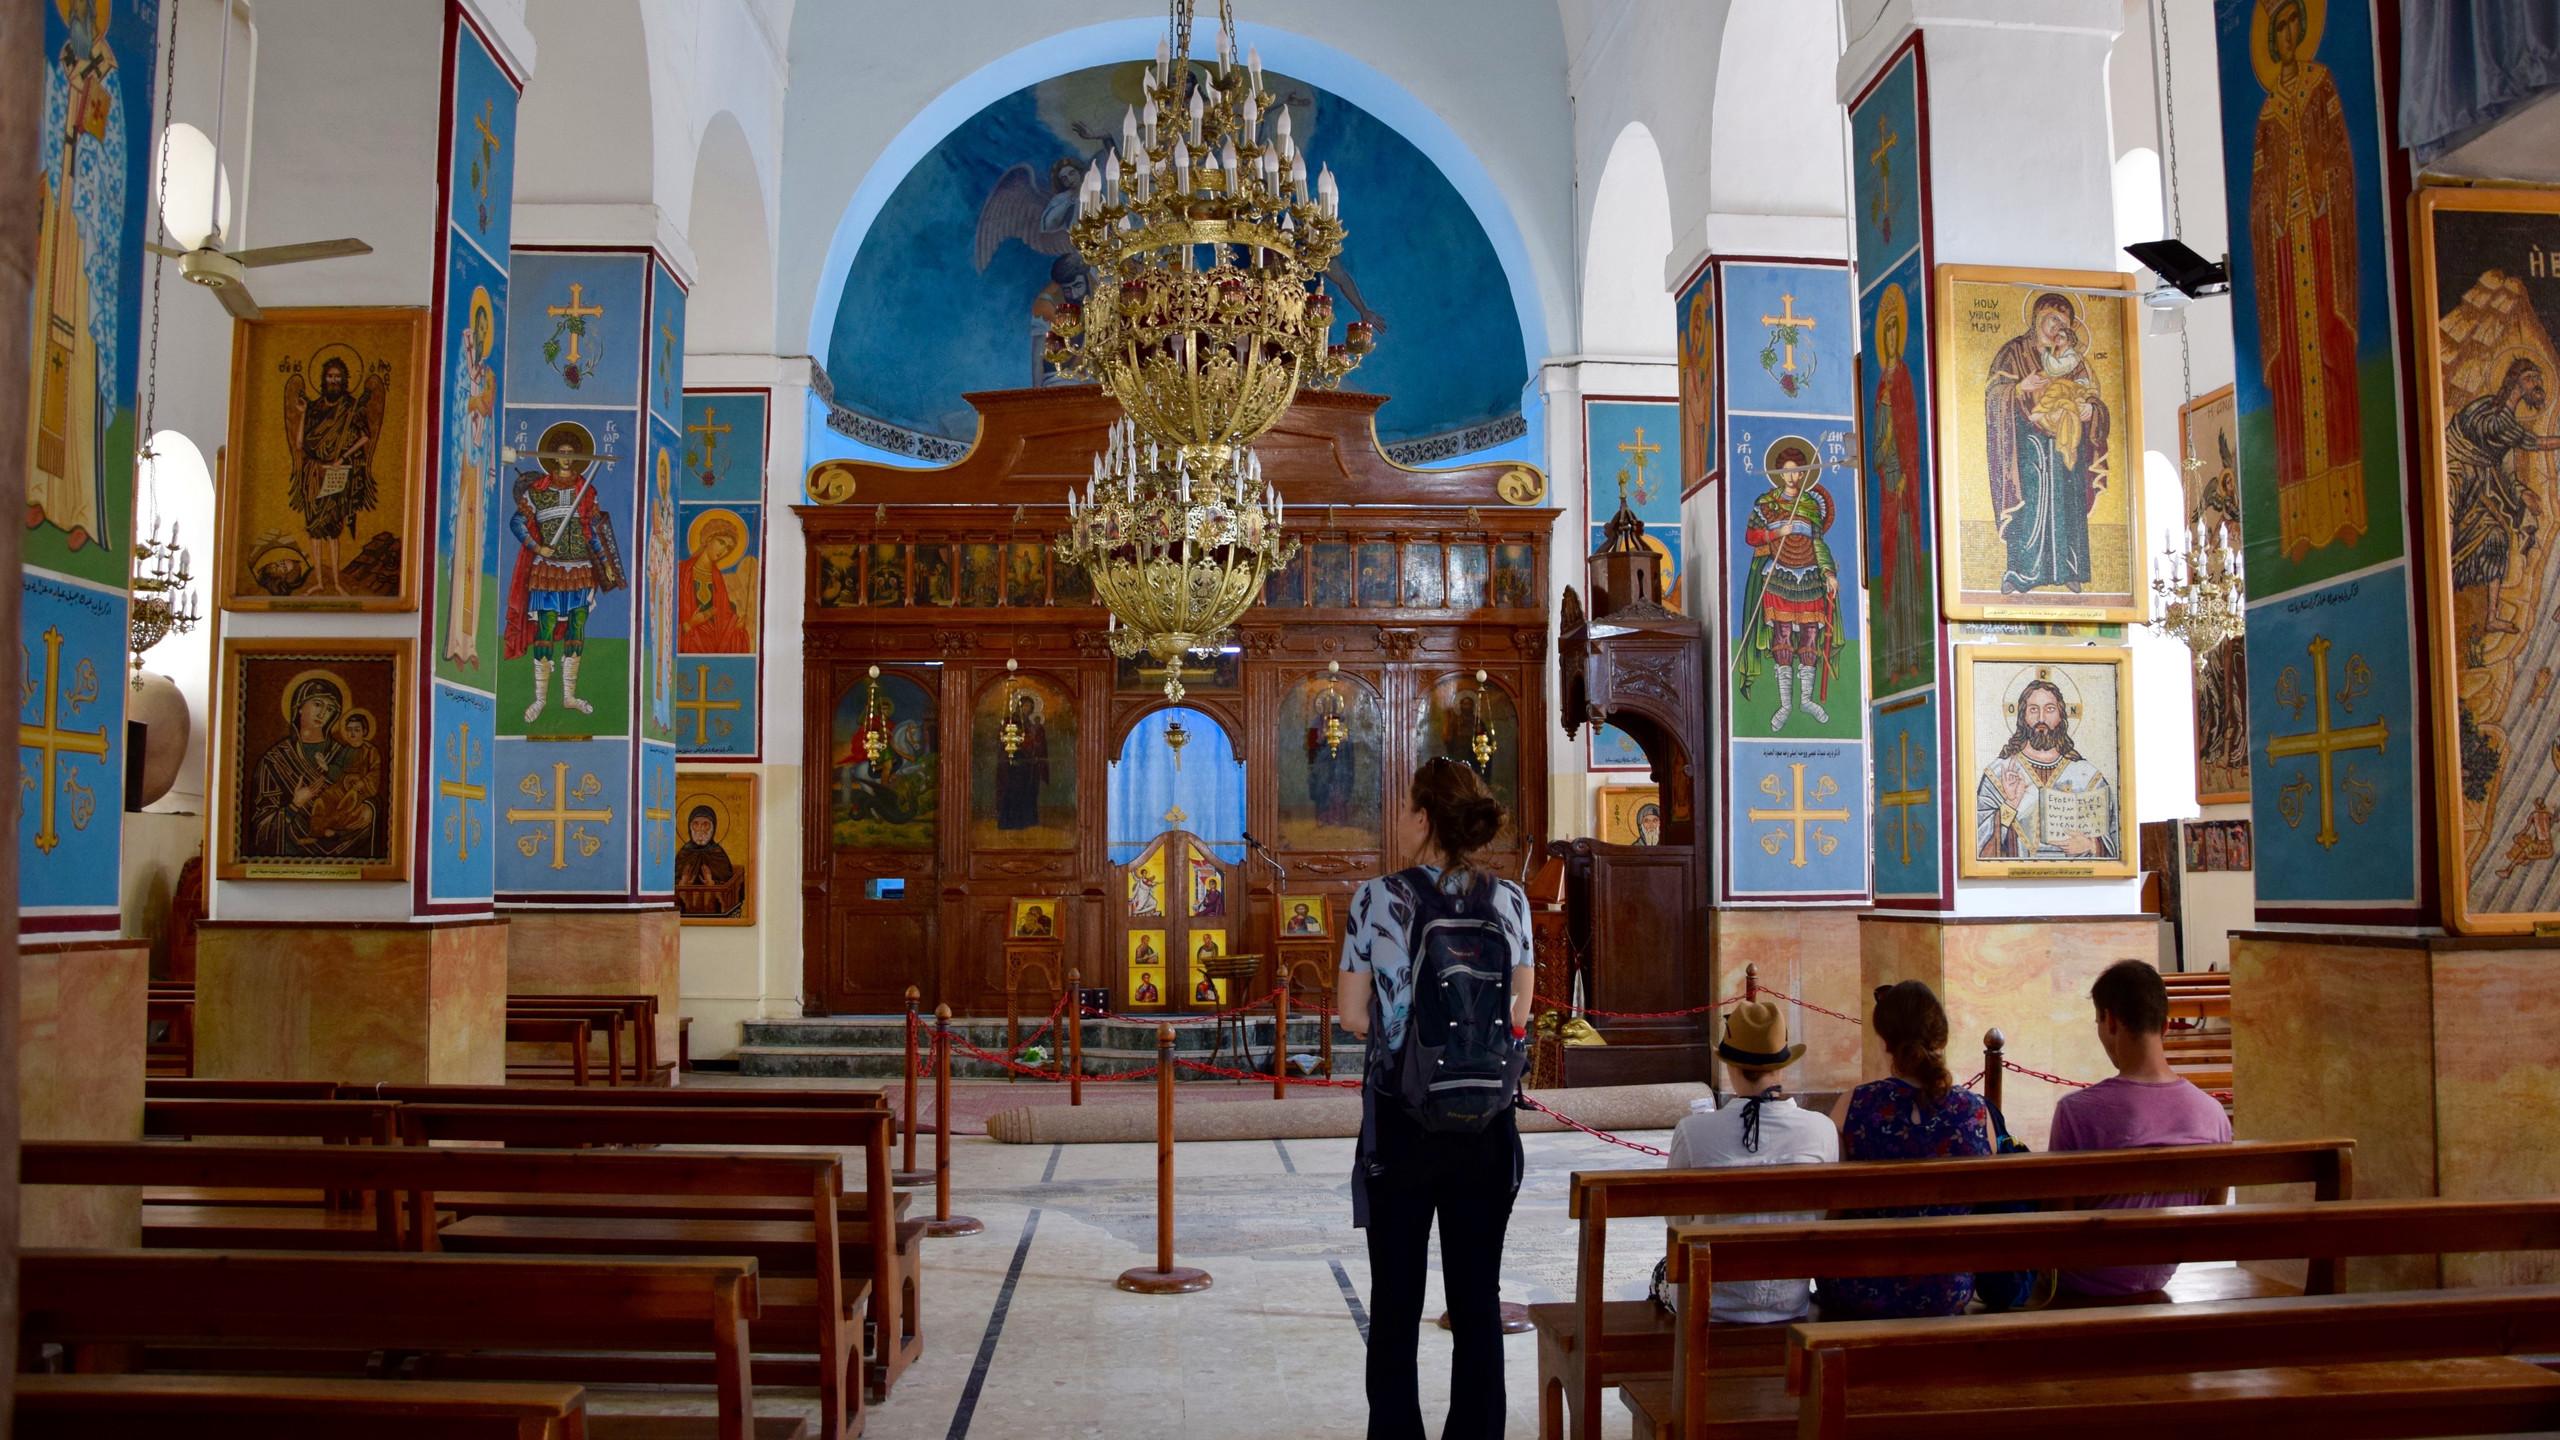 St. George's Church Madaba